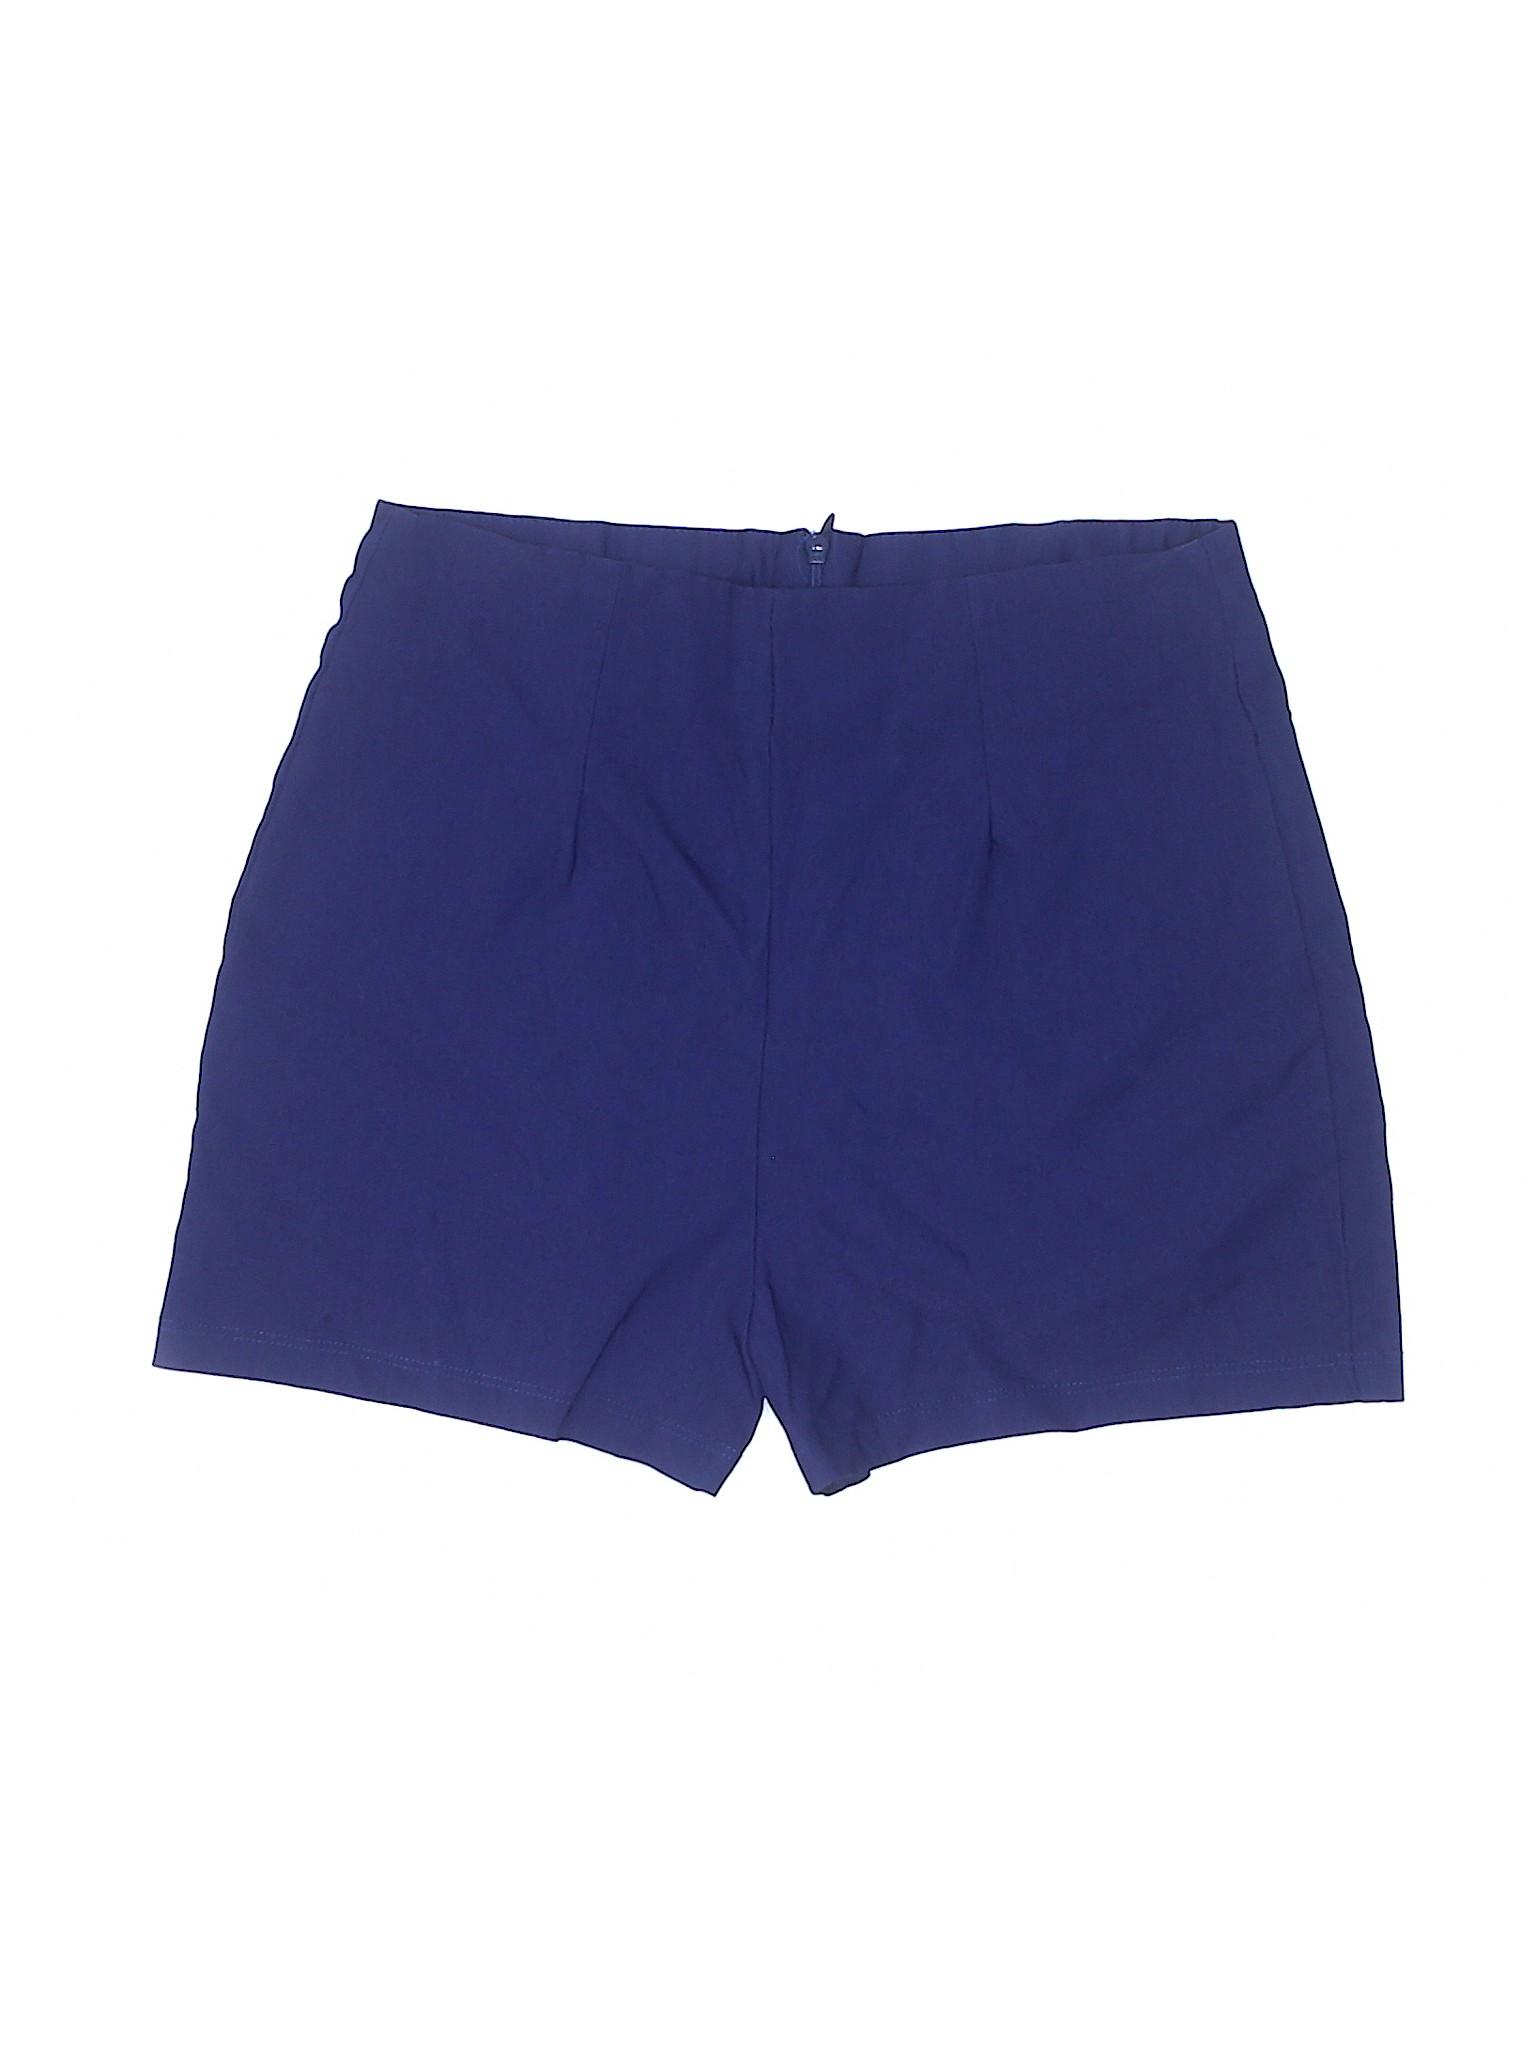 Boutique Shorts Kirra Shorts Shorts Dressy Kirra Boutique Kirra Dressy Boutique Dressy Boutique 8p8Z7